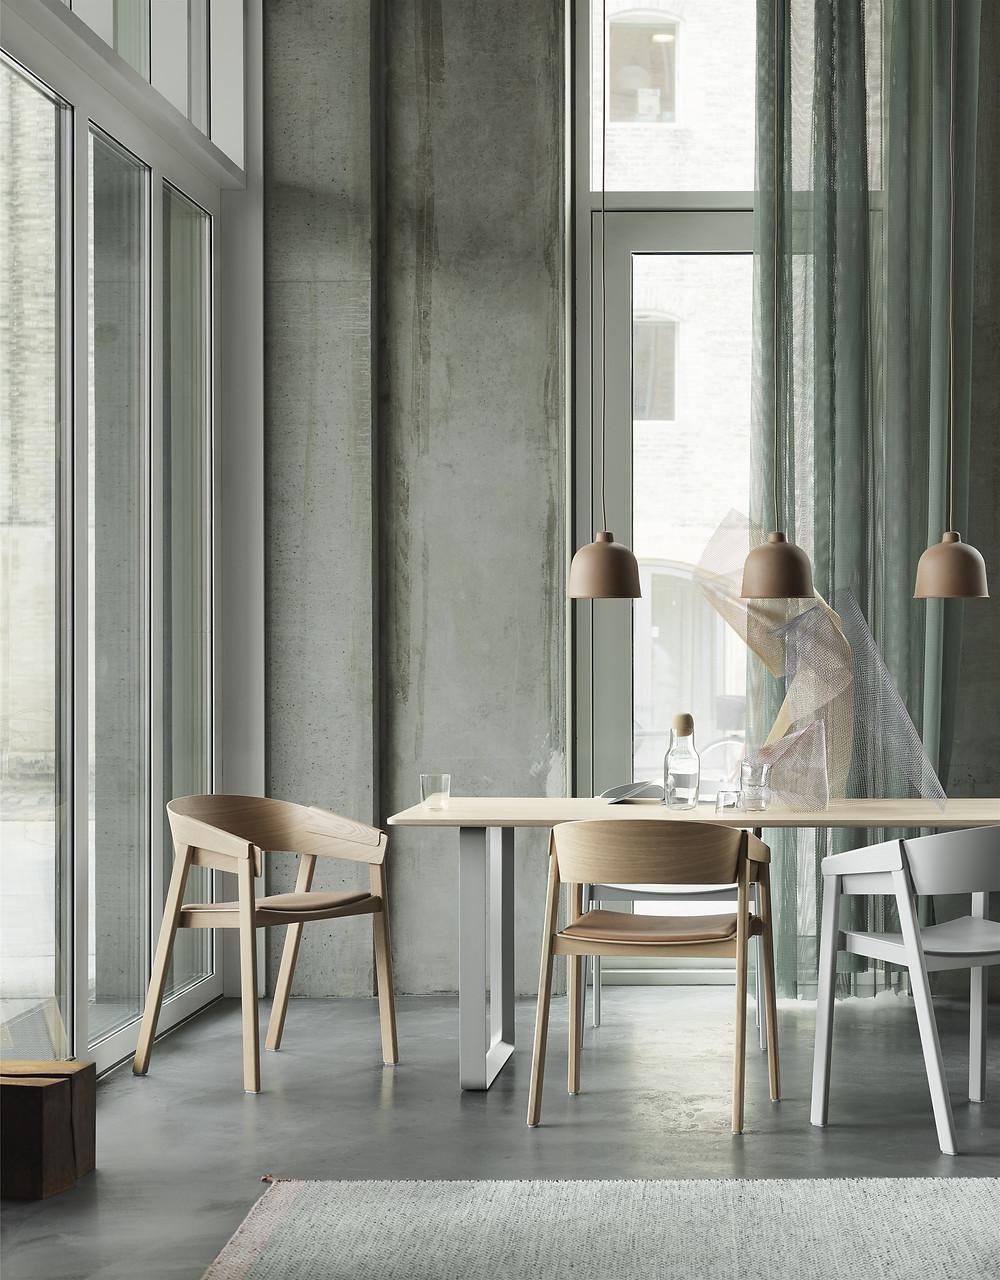 MUUTO | ТОП 10 магазинов мебели для скандинавского интерьера | блог SENKO architects | скандинавская мебель | мебель в скандинавском стиле | скандинавский стиль в интерьере | скандинавский интерьер | дизайн студия | дизайн бюро киев | дизайн интерьера украина